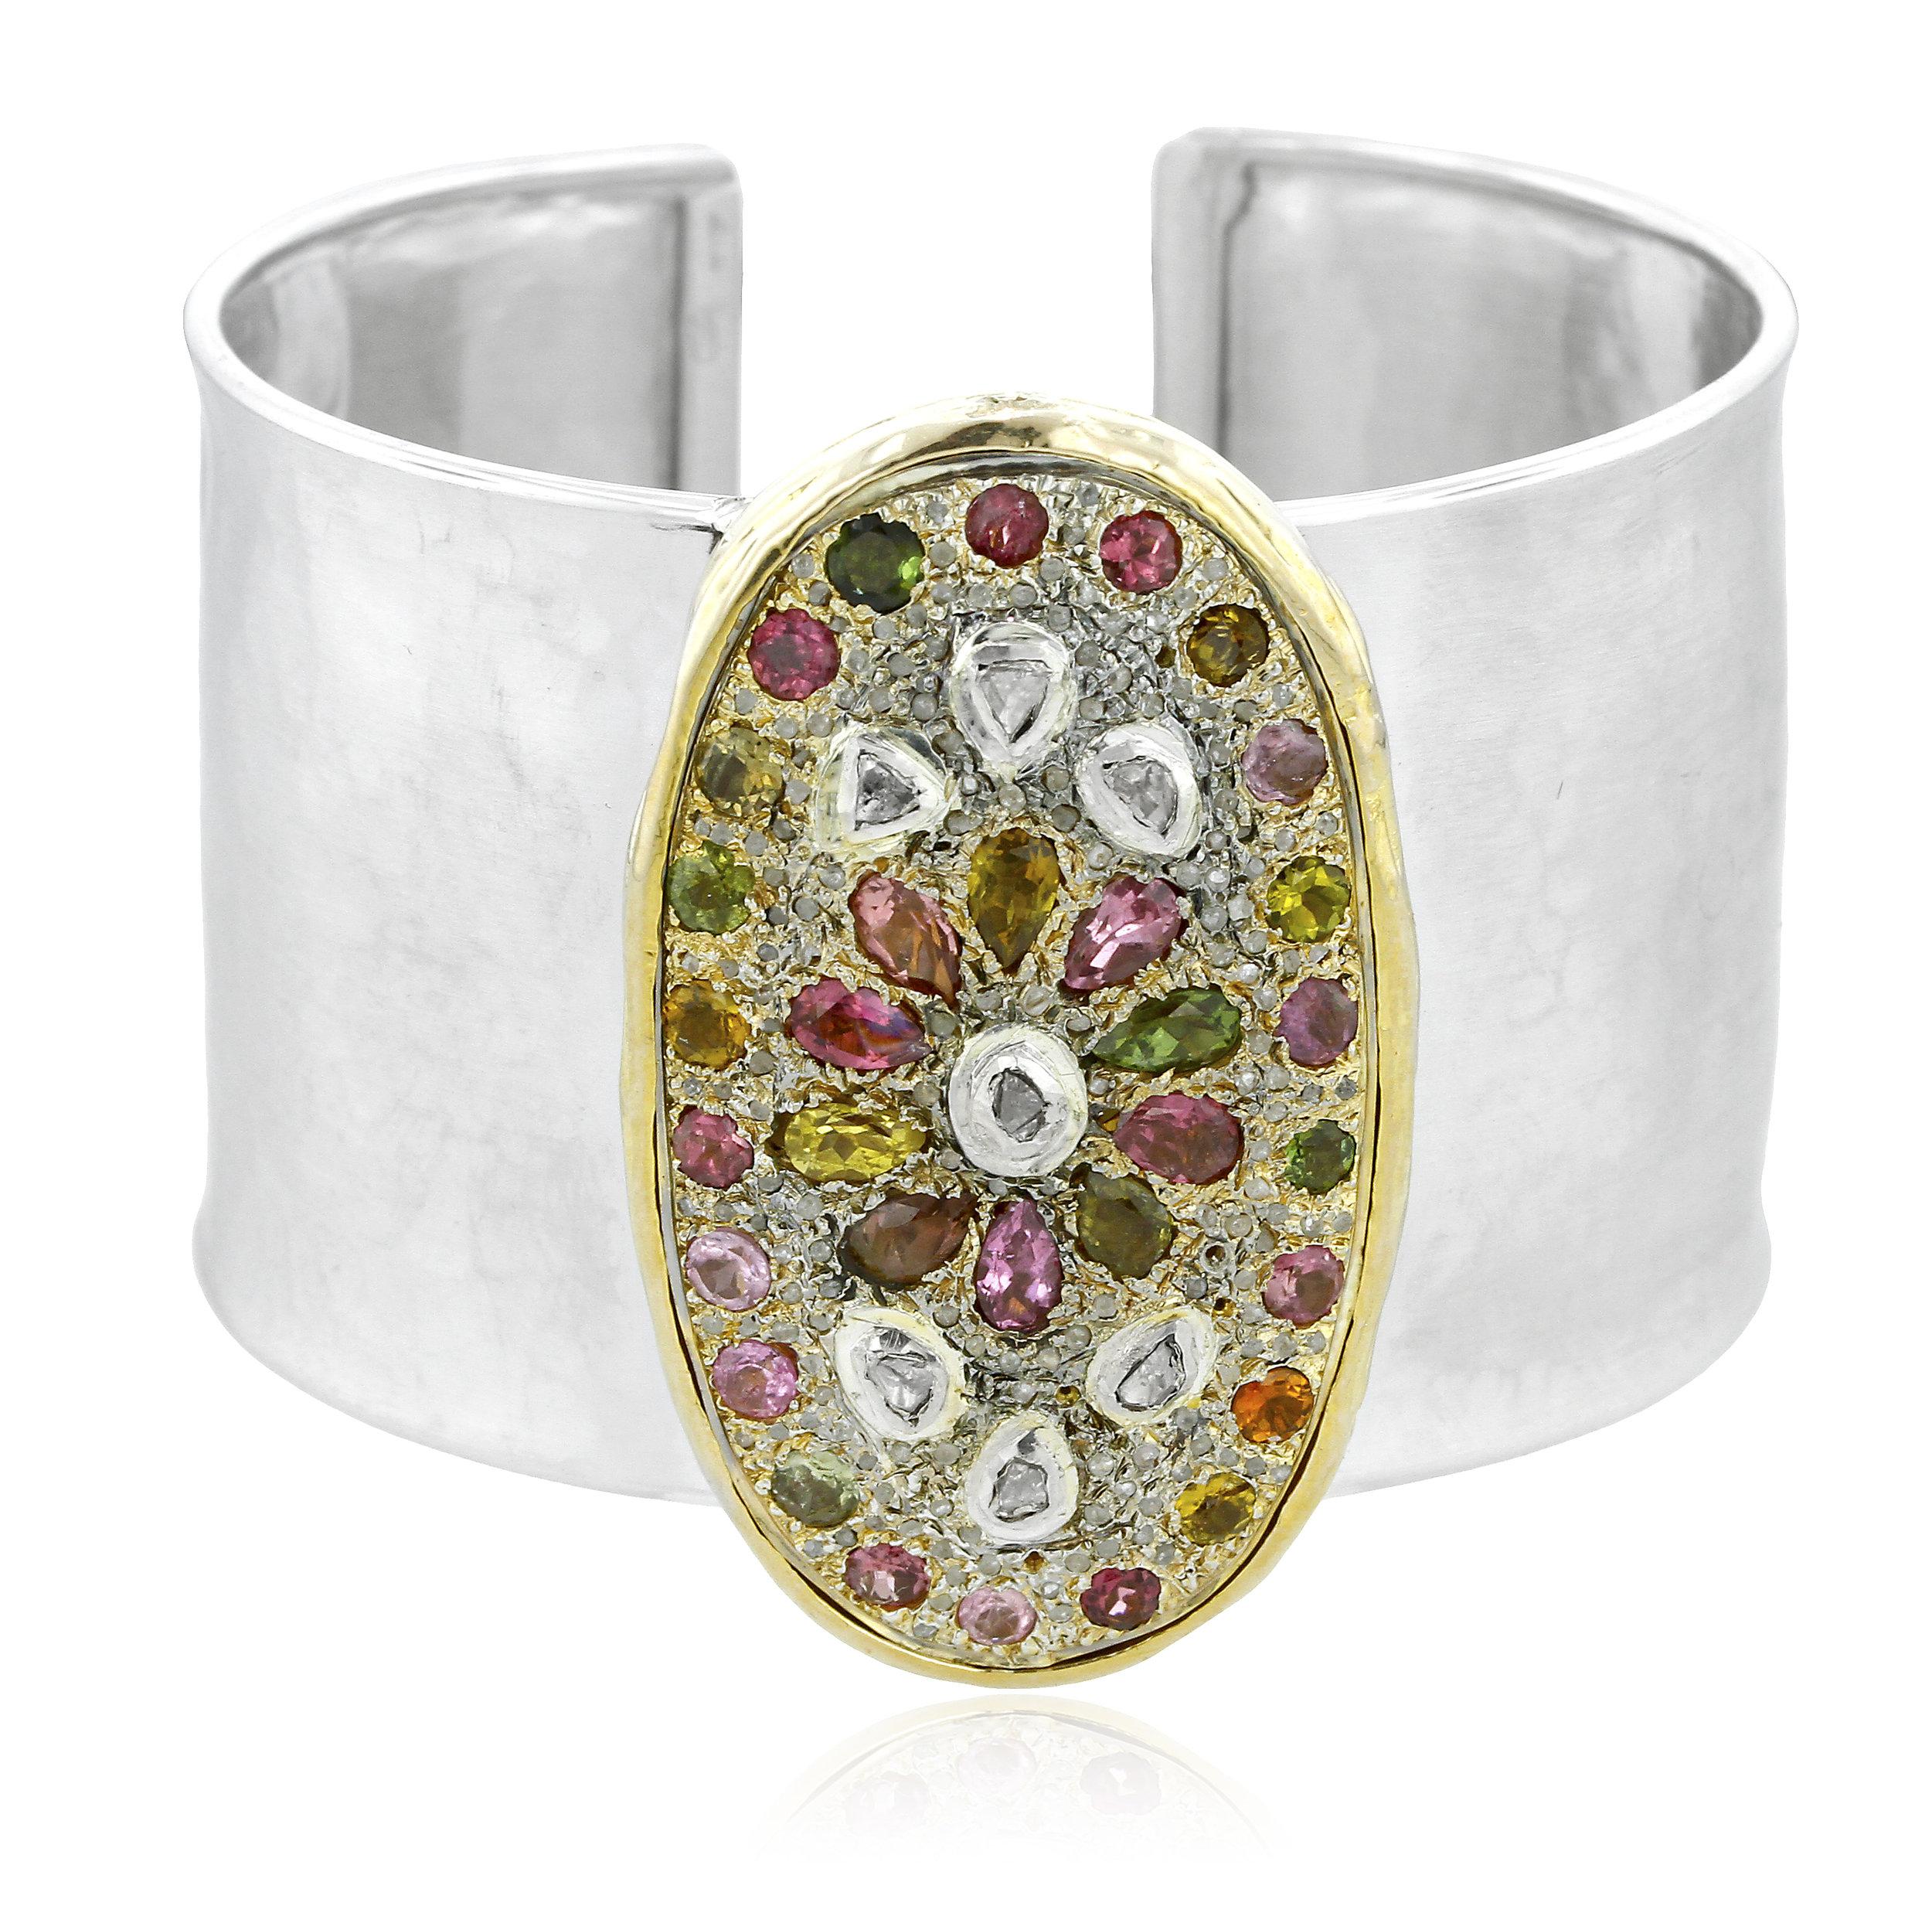 Bejeweled Cuff Bracelet.jpg